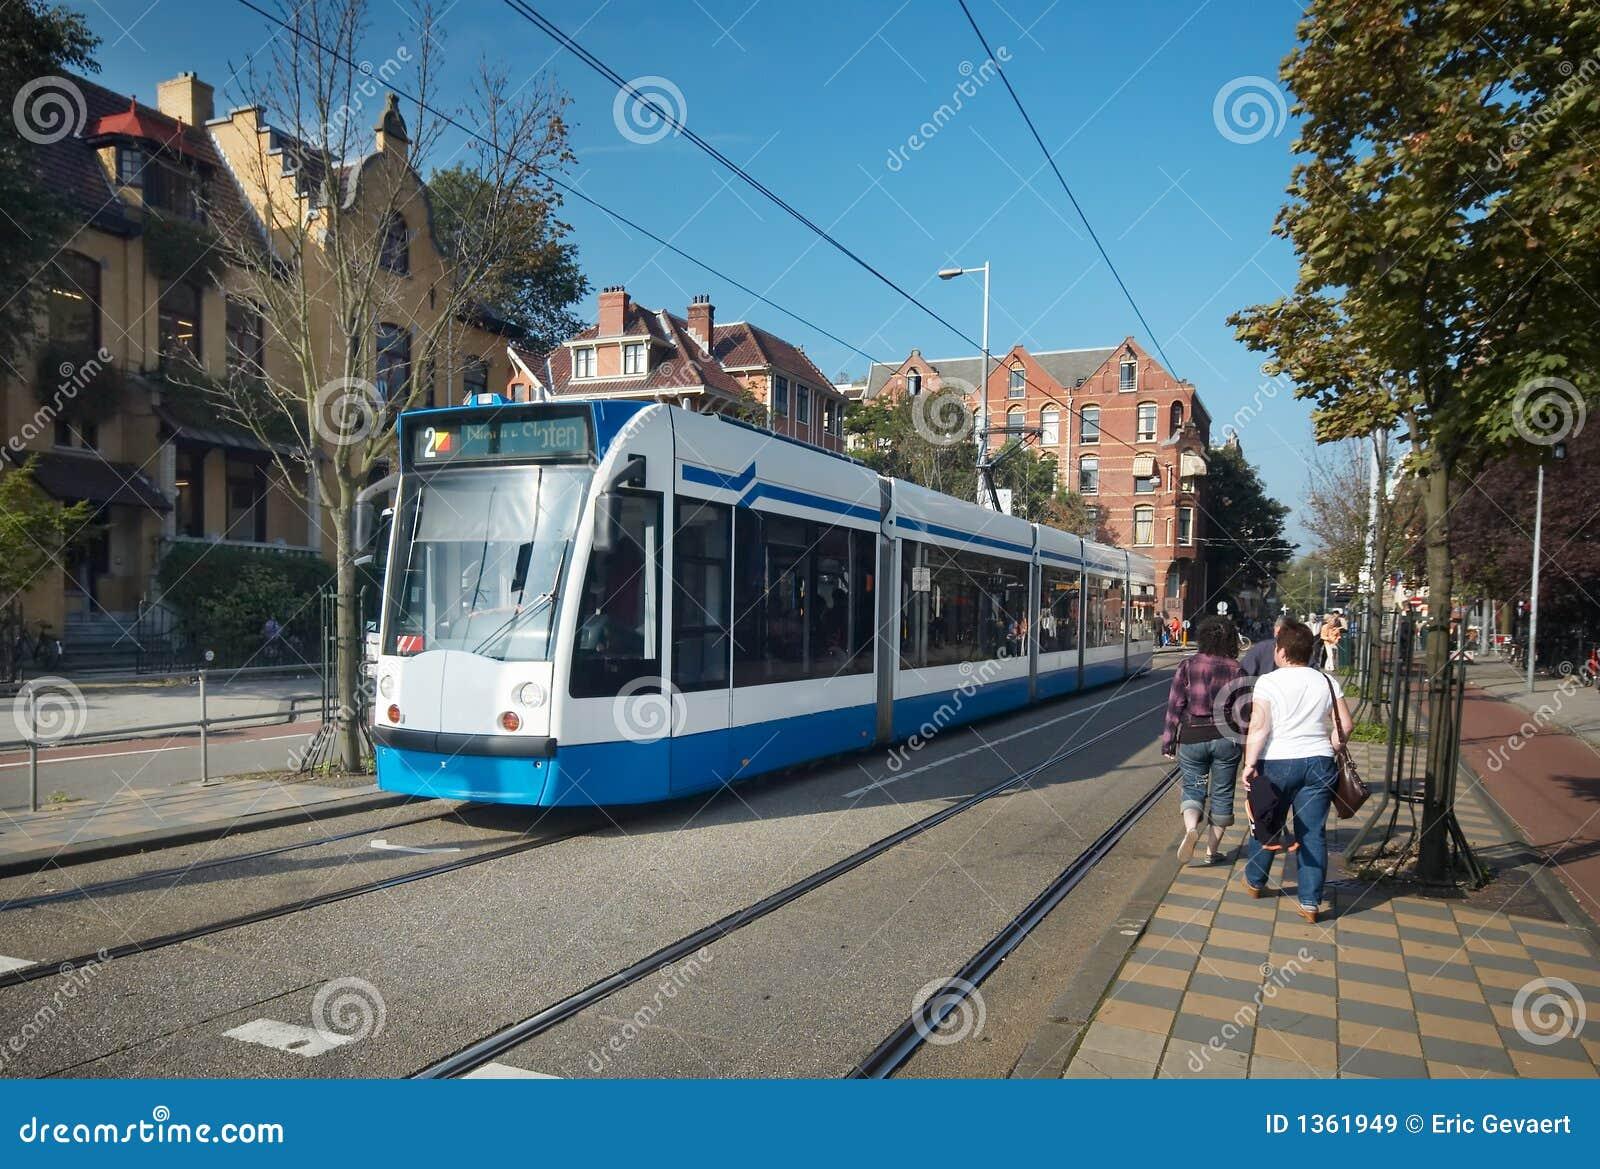 Amsterdam transport